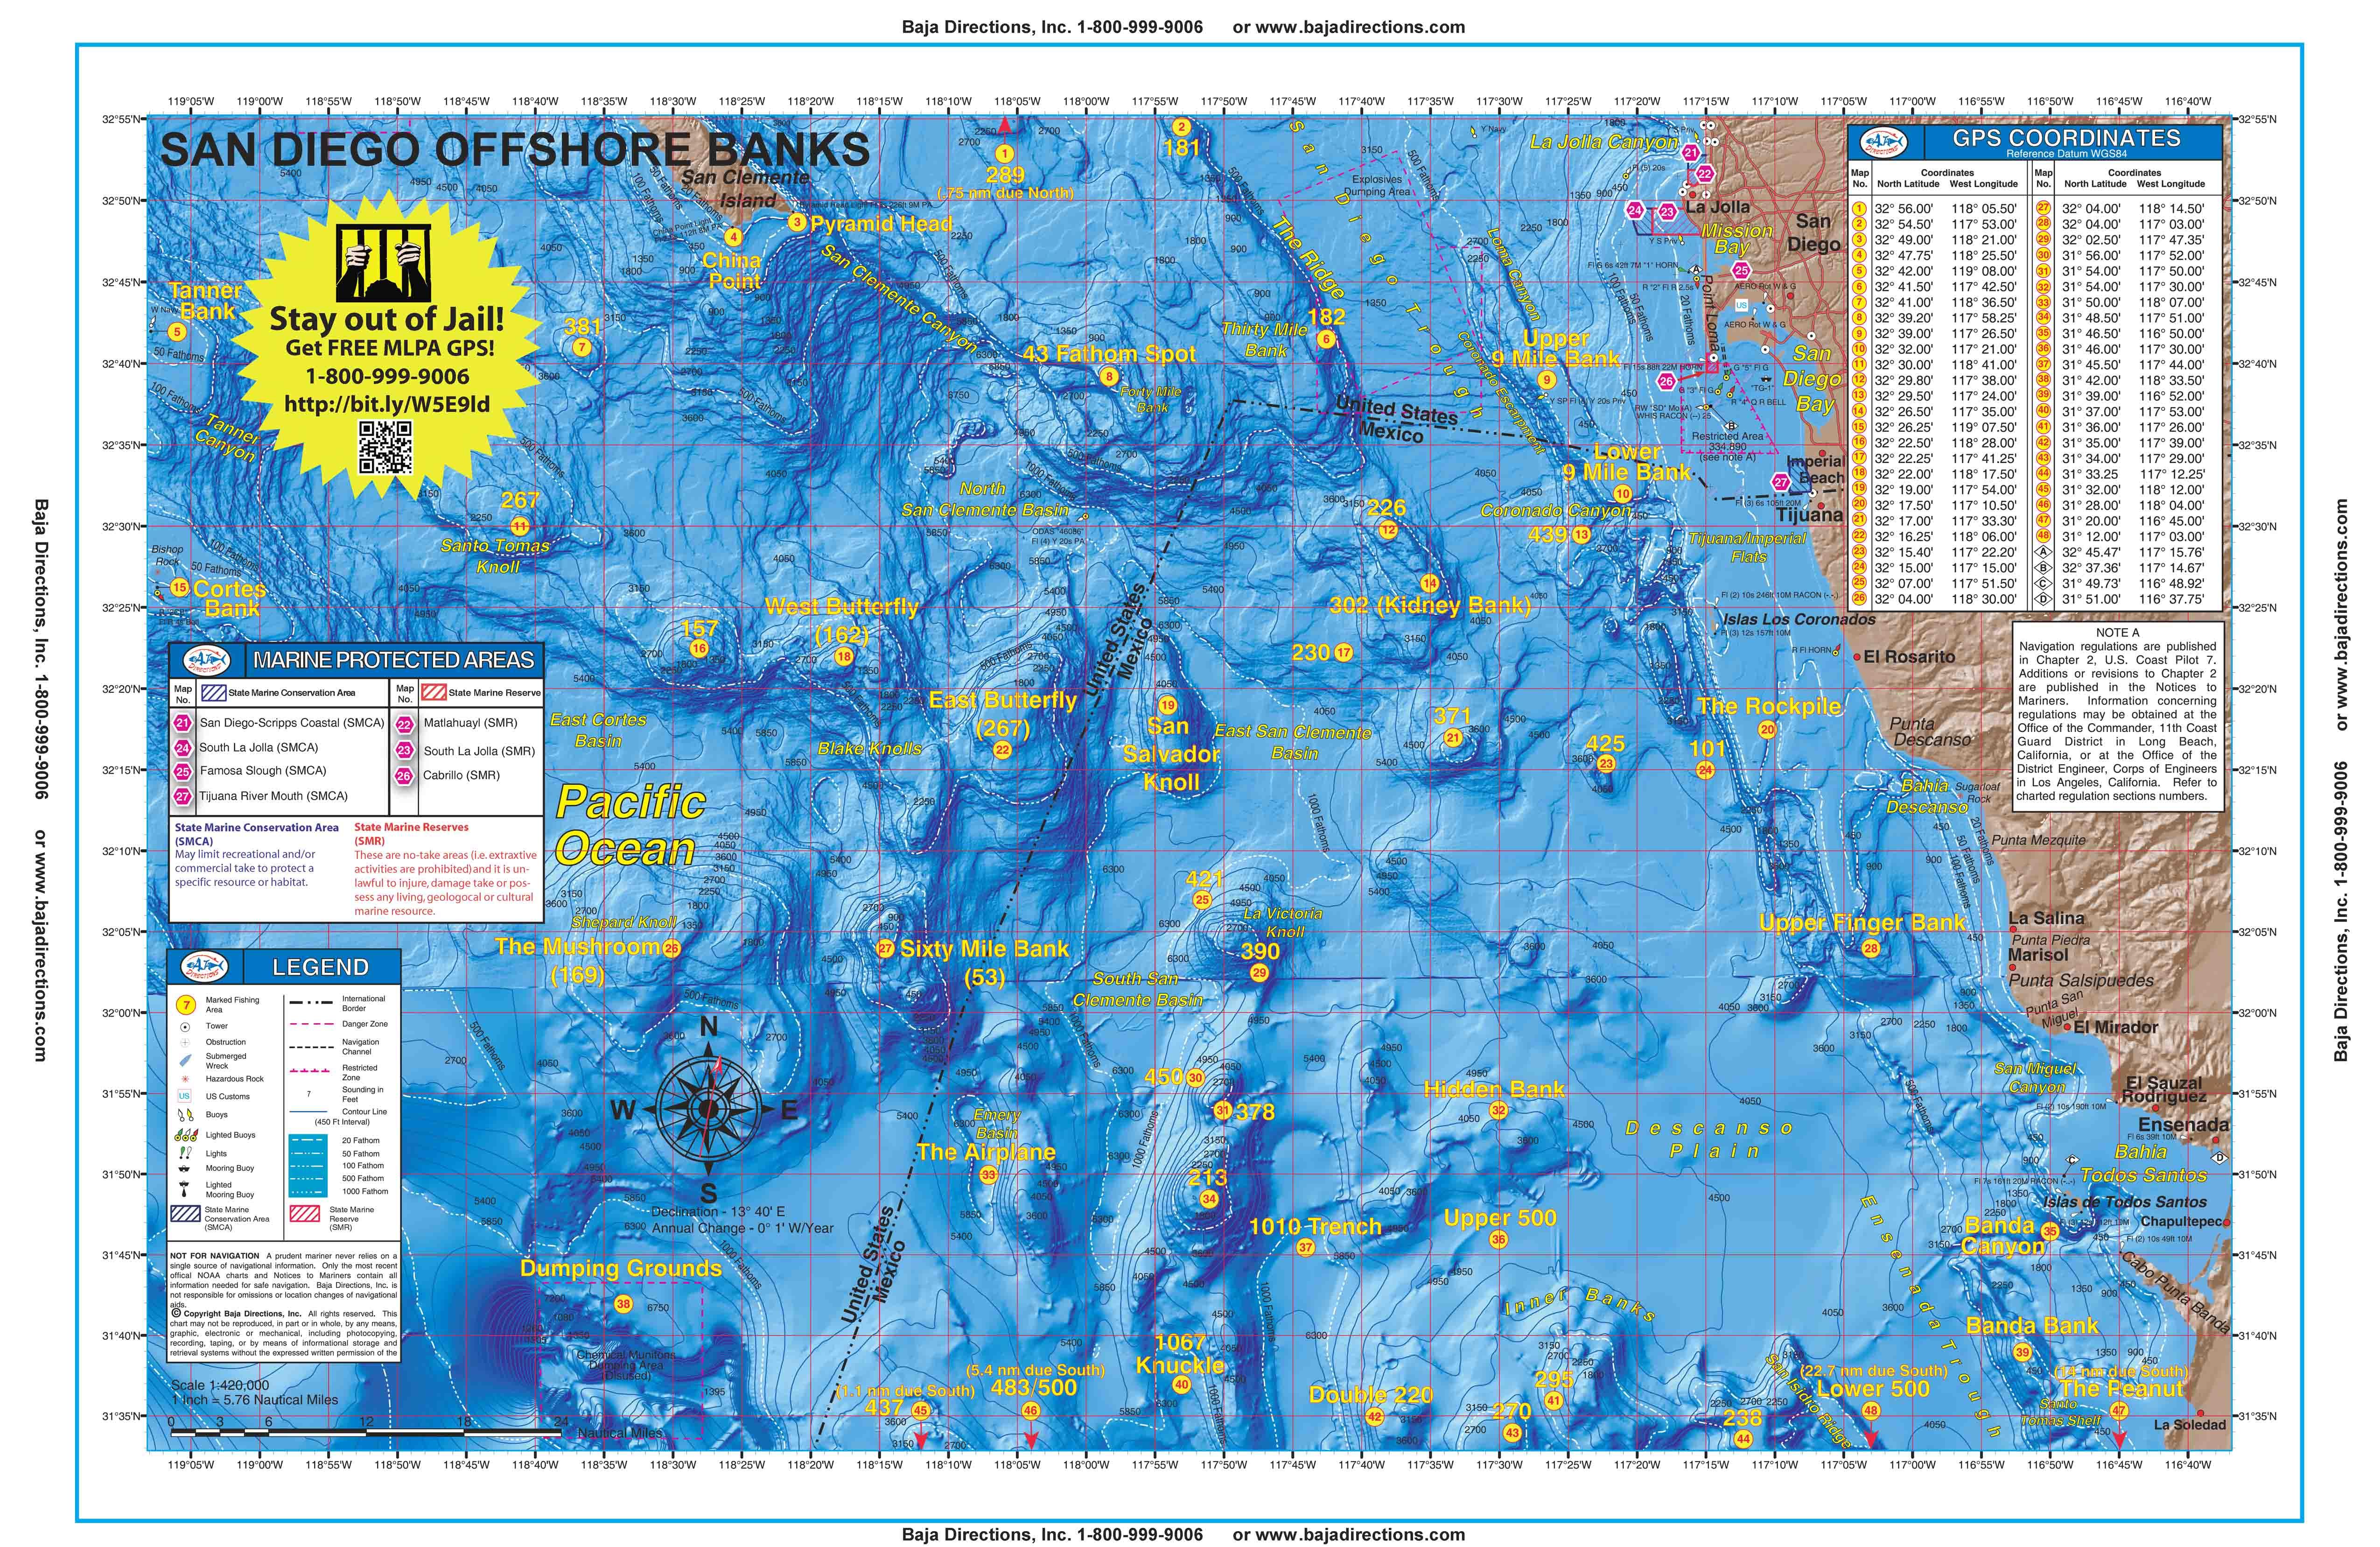 Sportfishing Atlas Southern California Edition - Baja Directions - Southern California Fishing Map